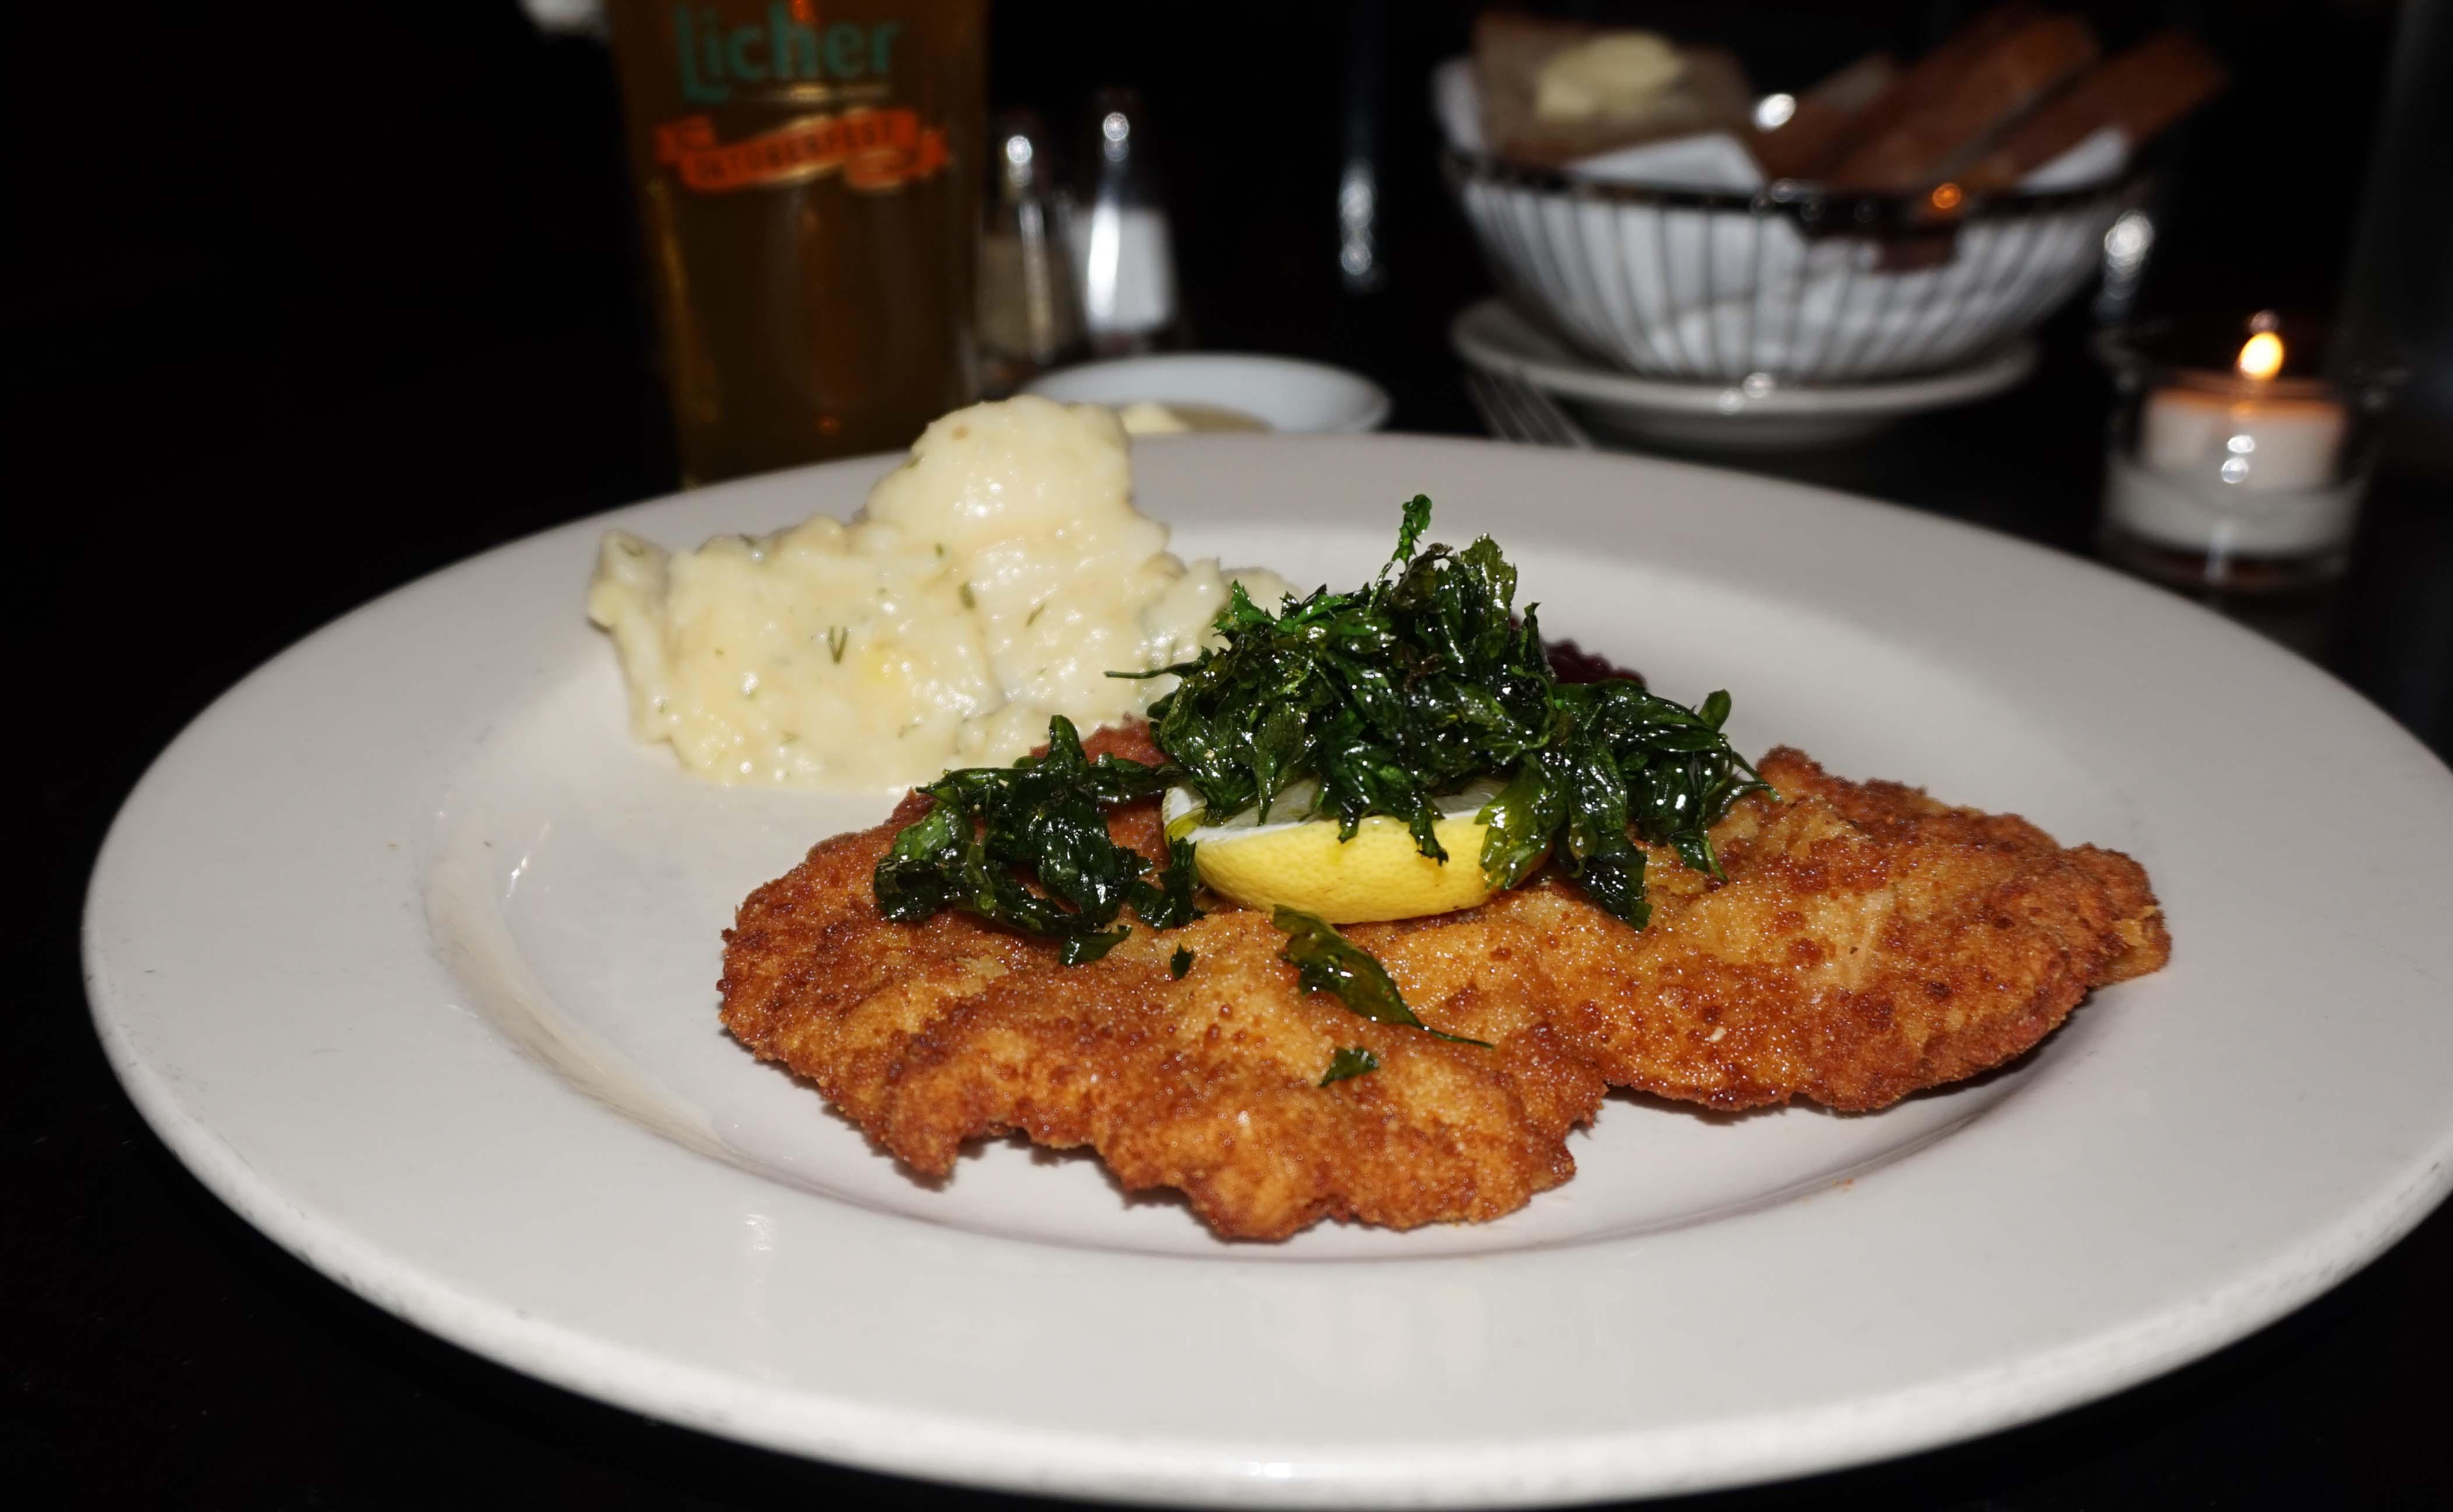 Bluea Gans pork schnitzel low